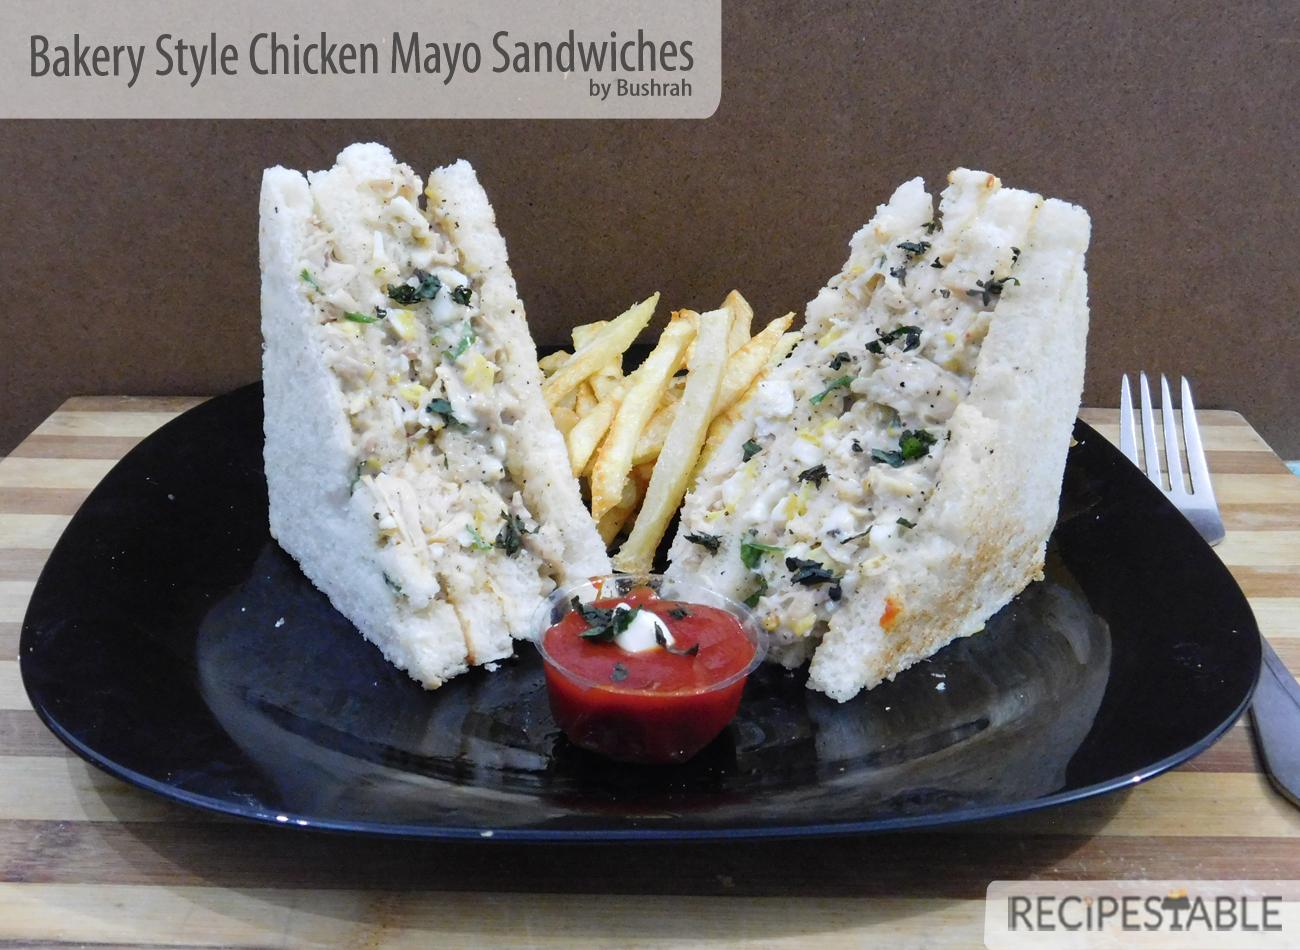 Bakery Style Chicken Mayo Sandwiches Recipe